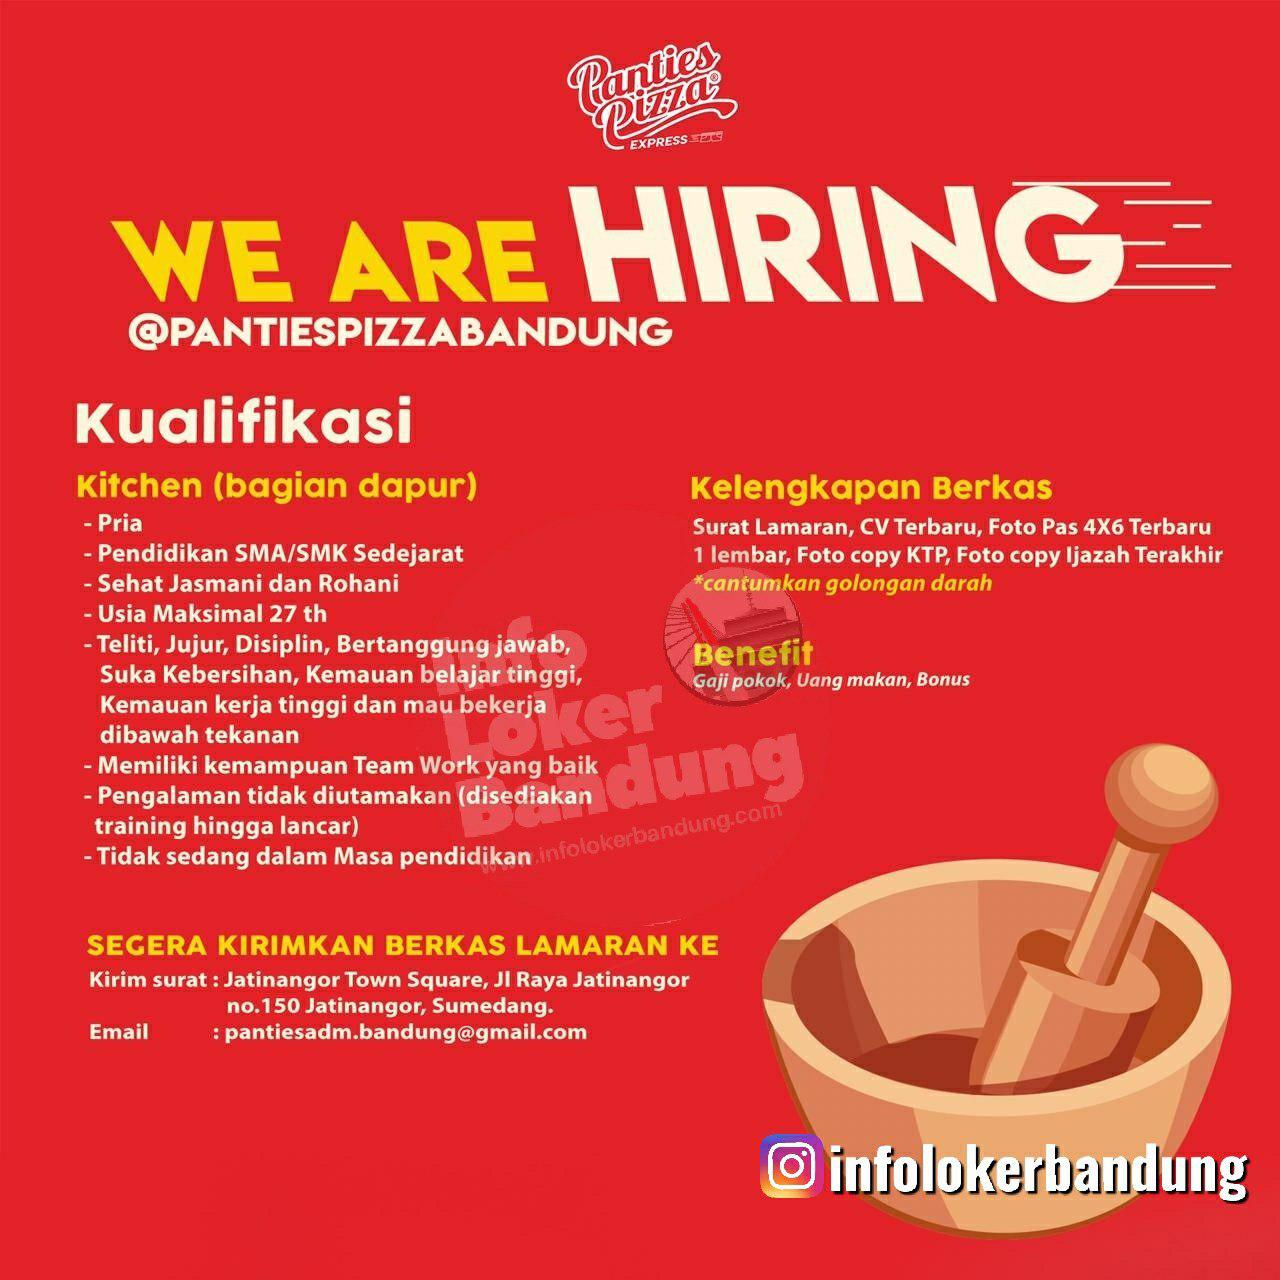 Lowongan Kerja Panties Pizza Bandung Juli 2019